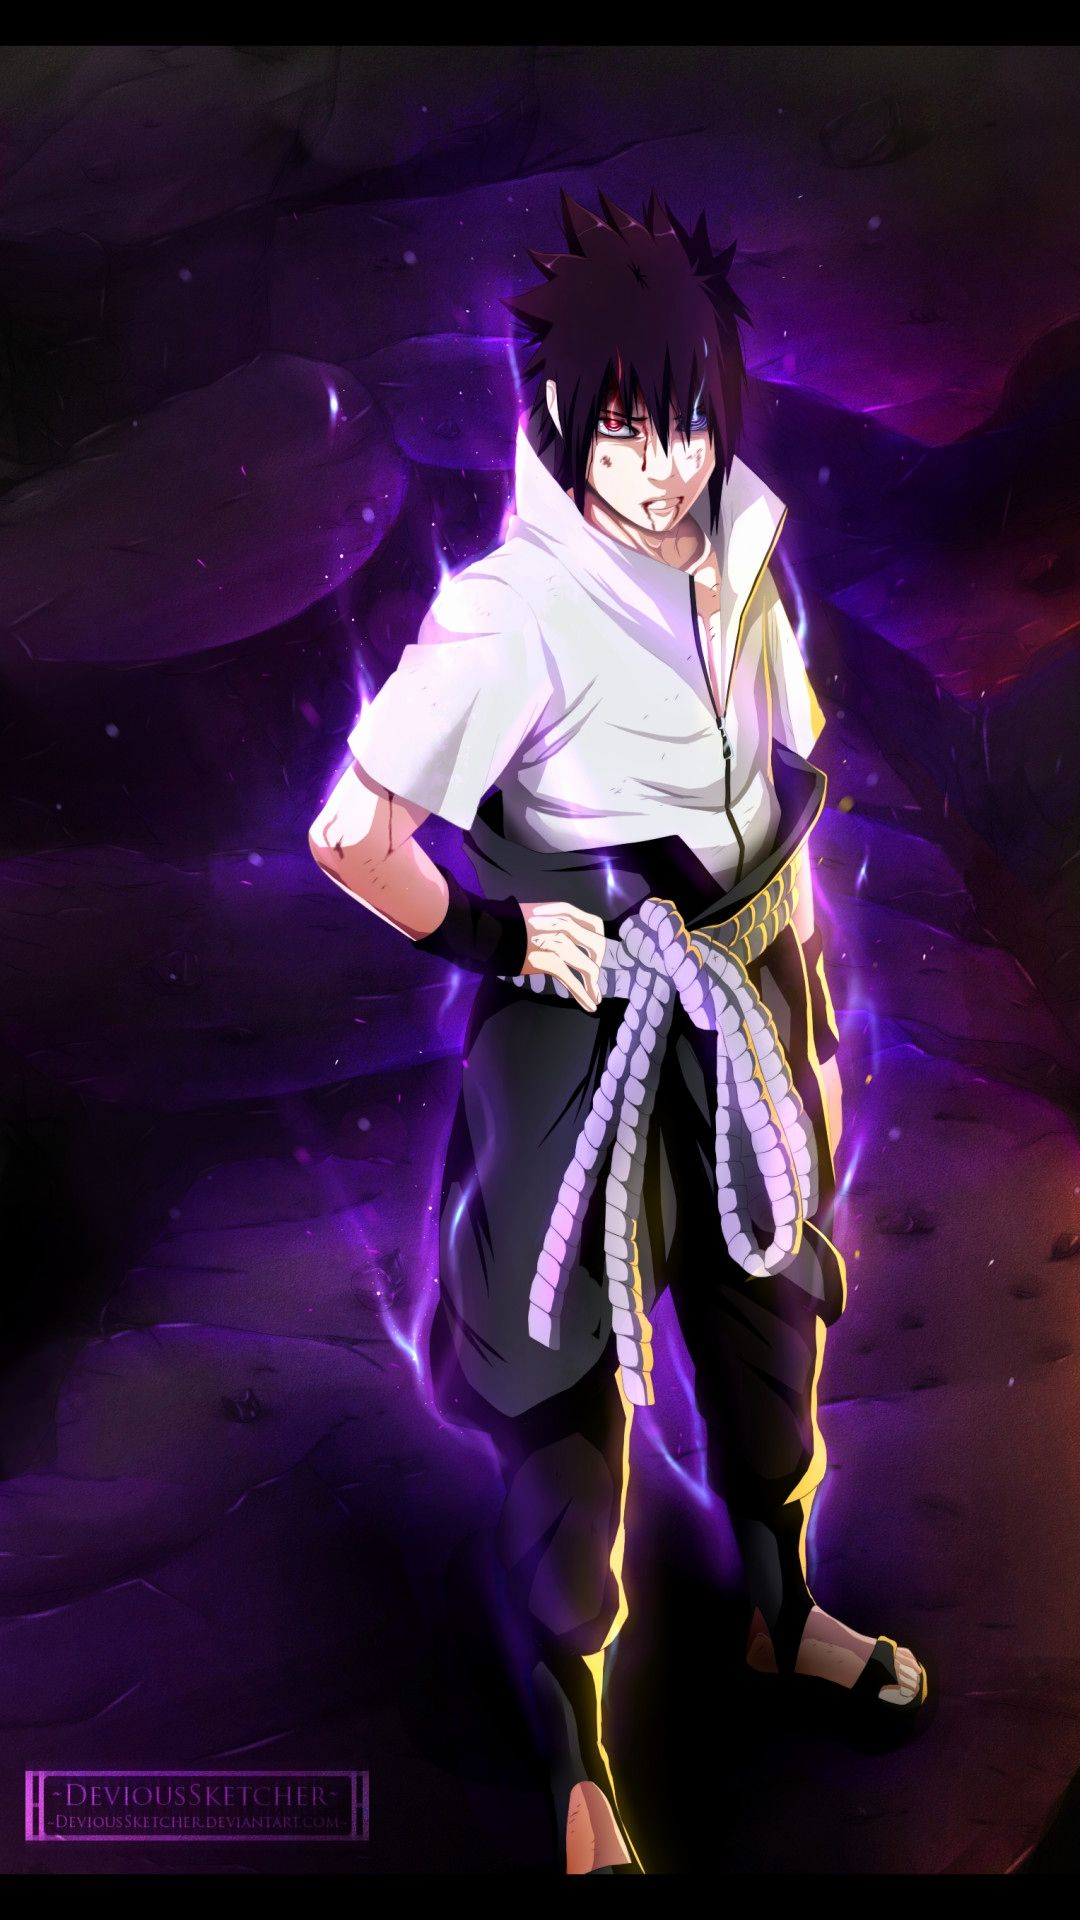 Naruto And Sasuke As Adults Wallpapers - Wallpaper Cave